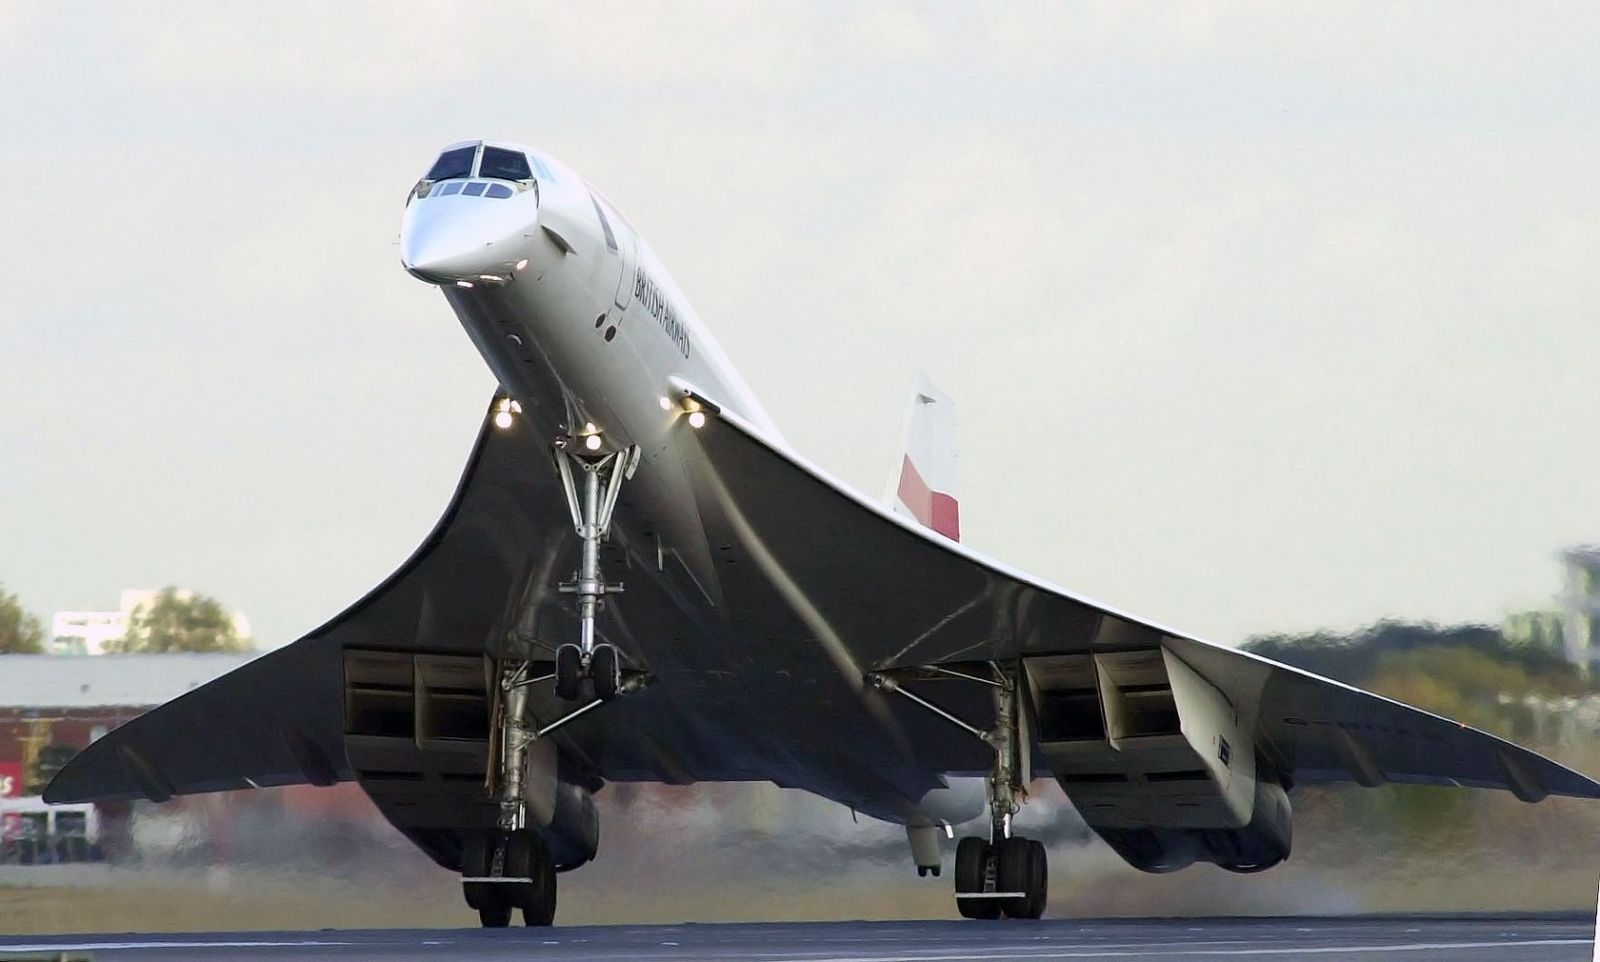 Concorde landing in London